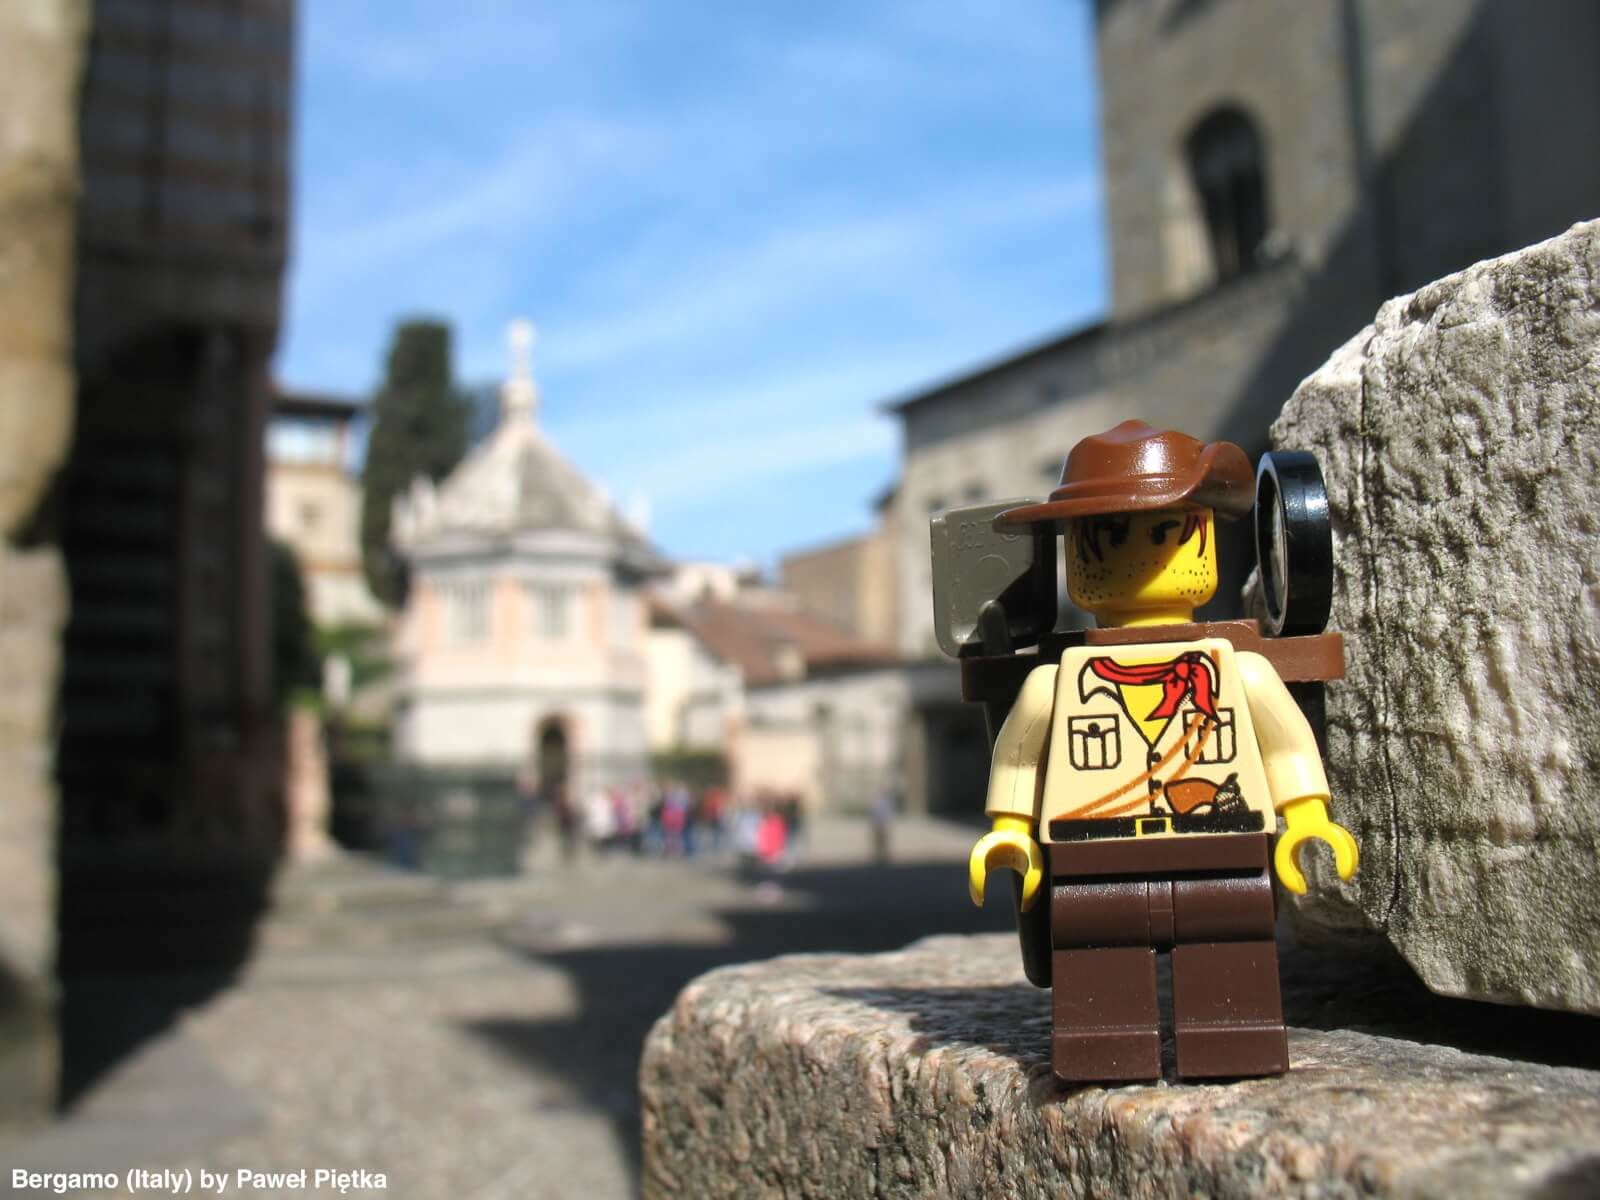 Bergamo (Italy) - Piazza Duomo